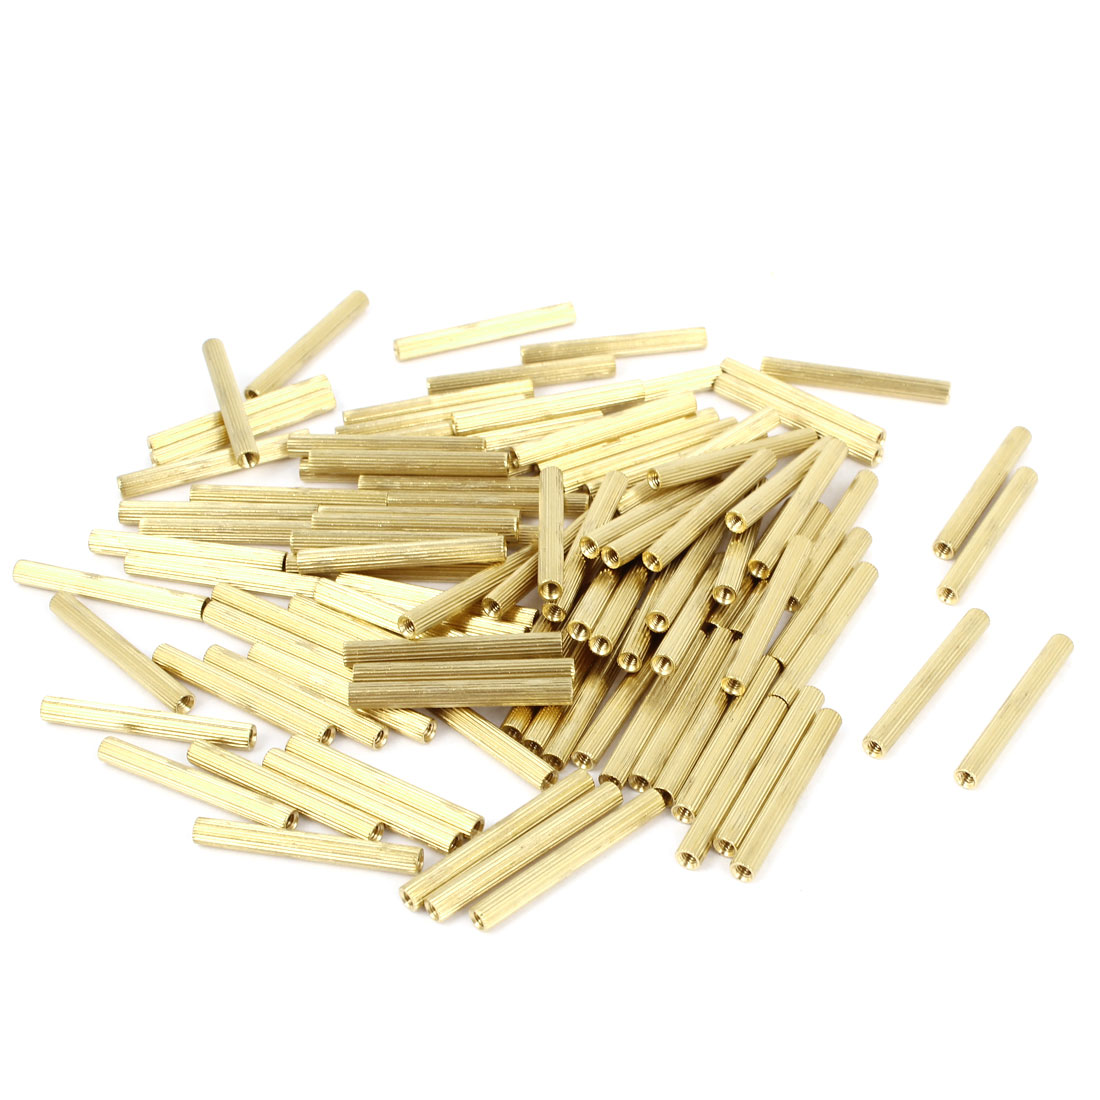 100 Pcs Female Threaded Pillars Brass Standoff Spacer Gold Tone M2x26mm